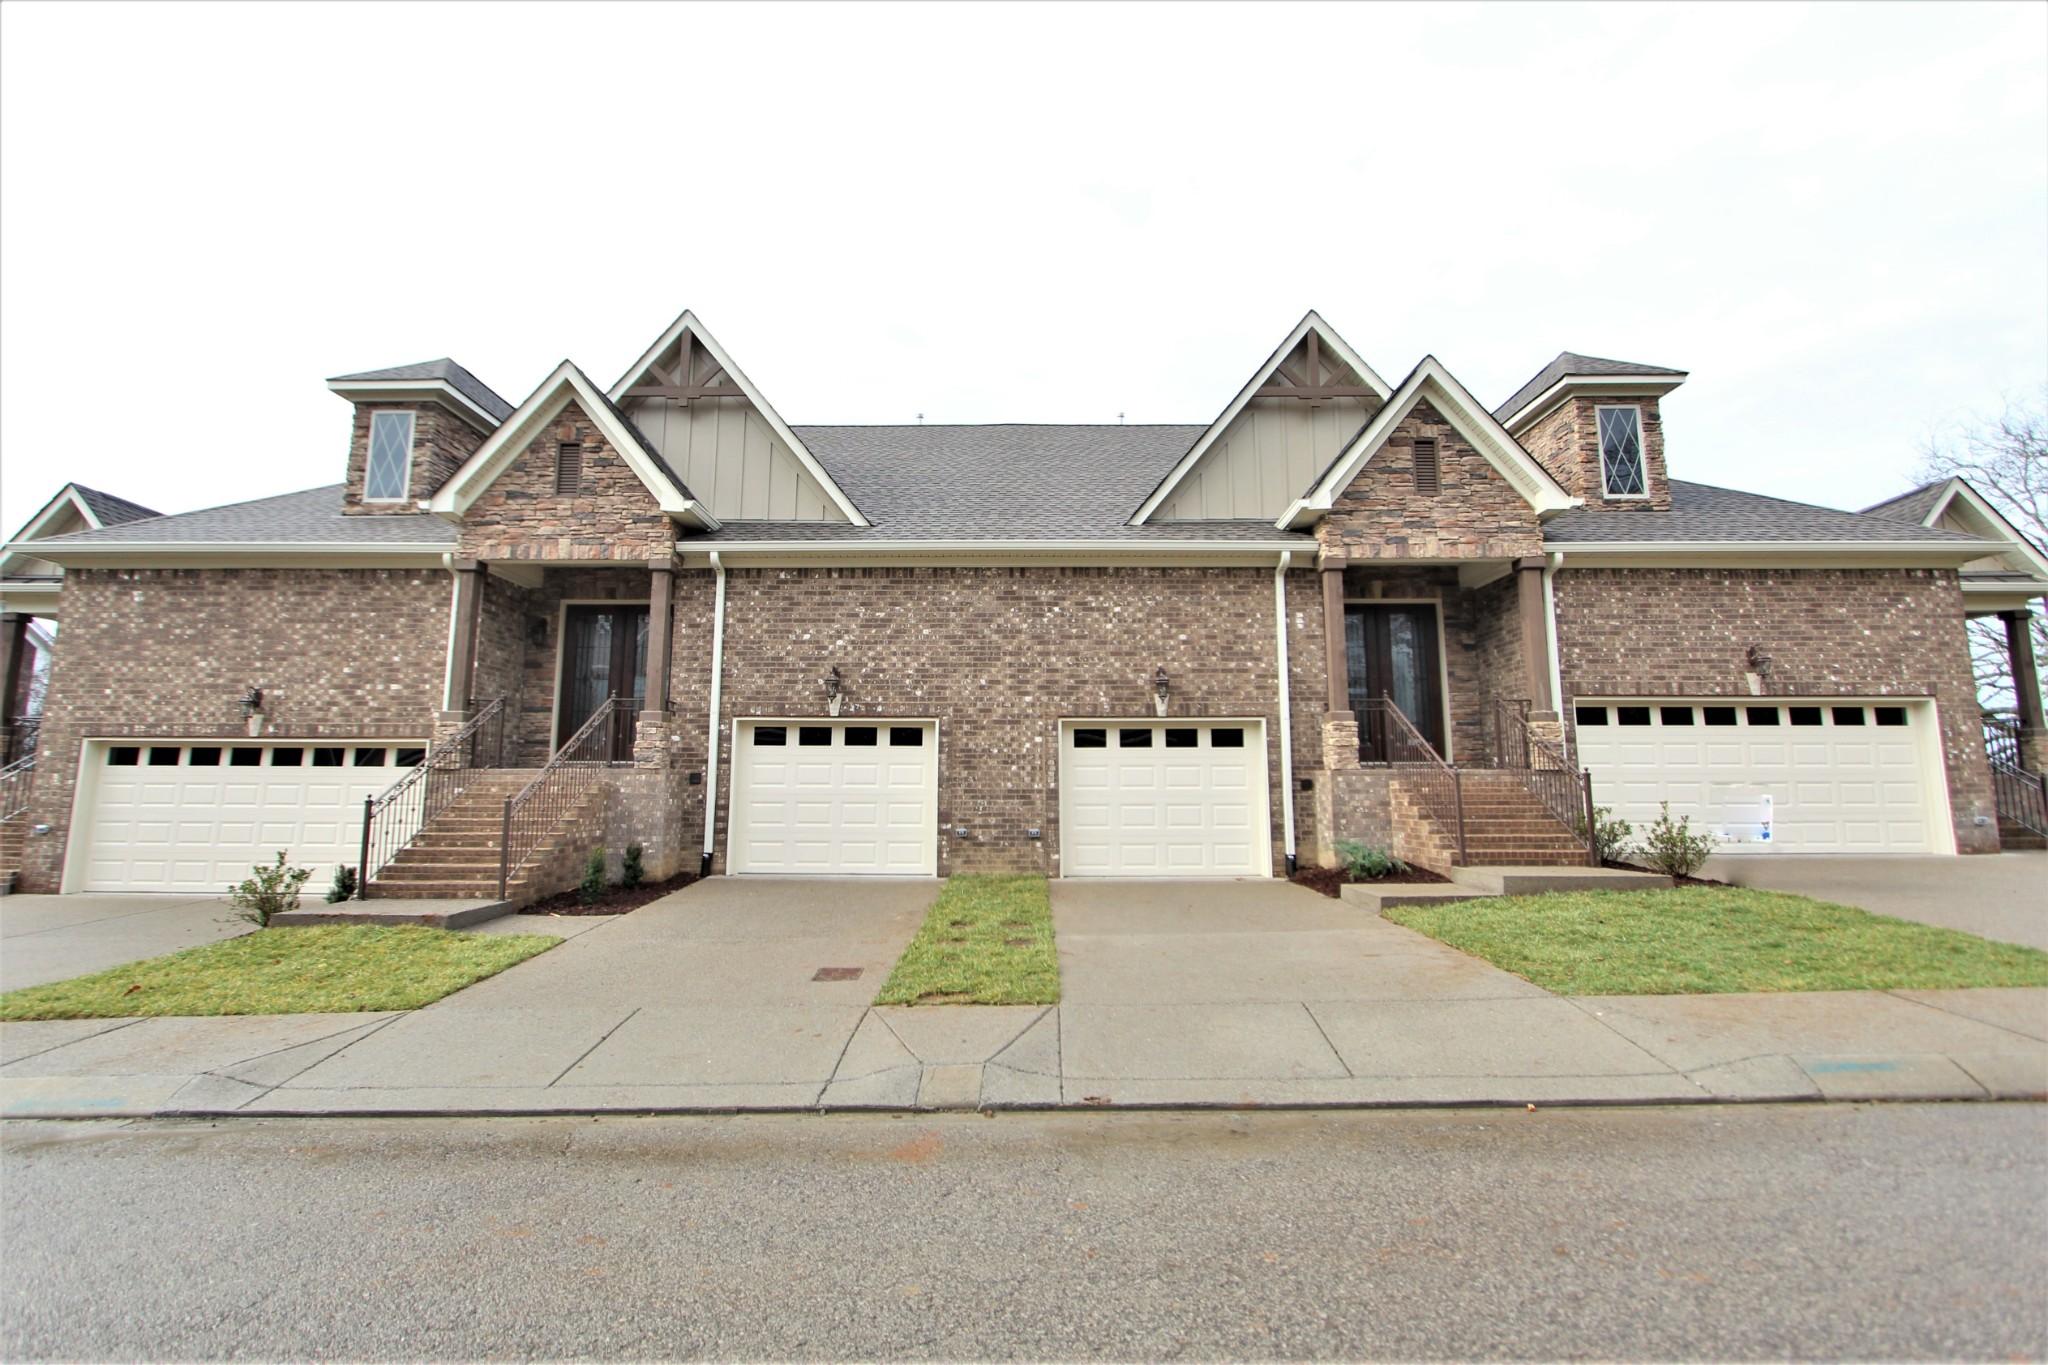 5000 Southfork Blvd #23, Old Hickory, TN 37138 - Old Hickory, TN real estate listing